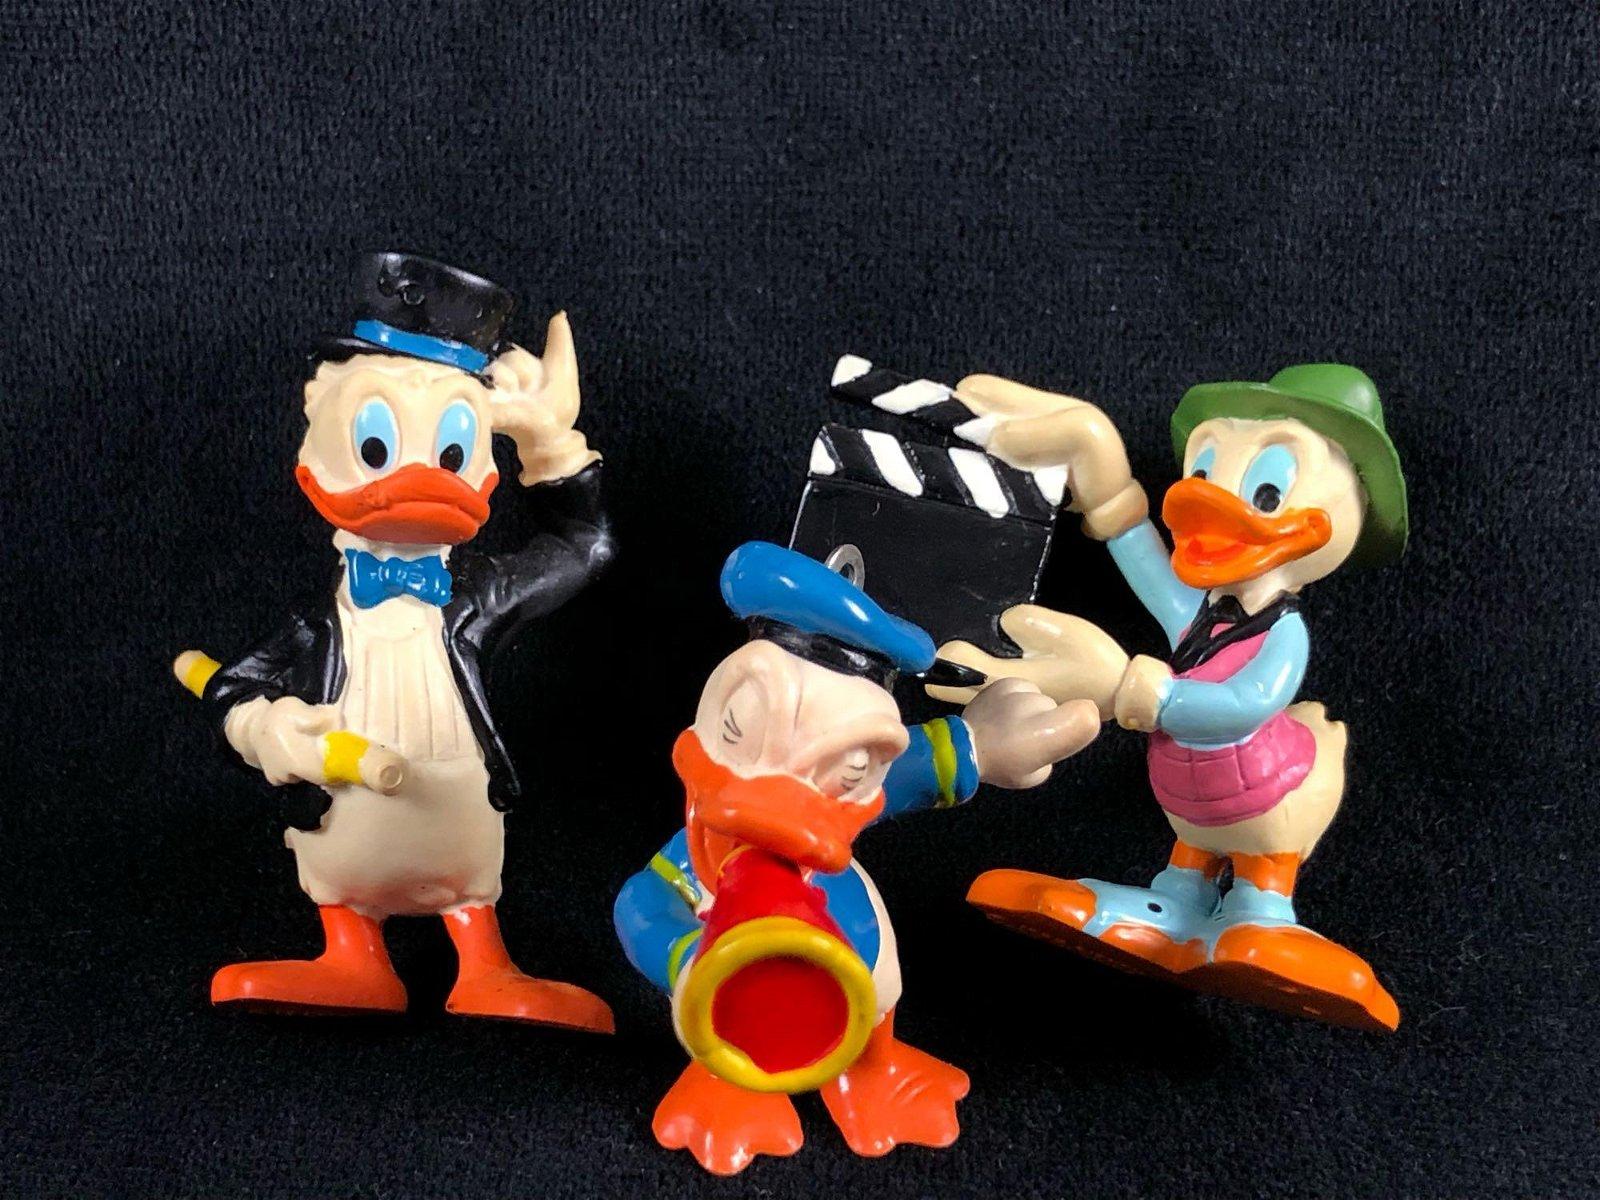 Lot of 3 Vintage Donald Duck Lights Camera Action Film